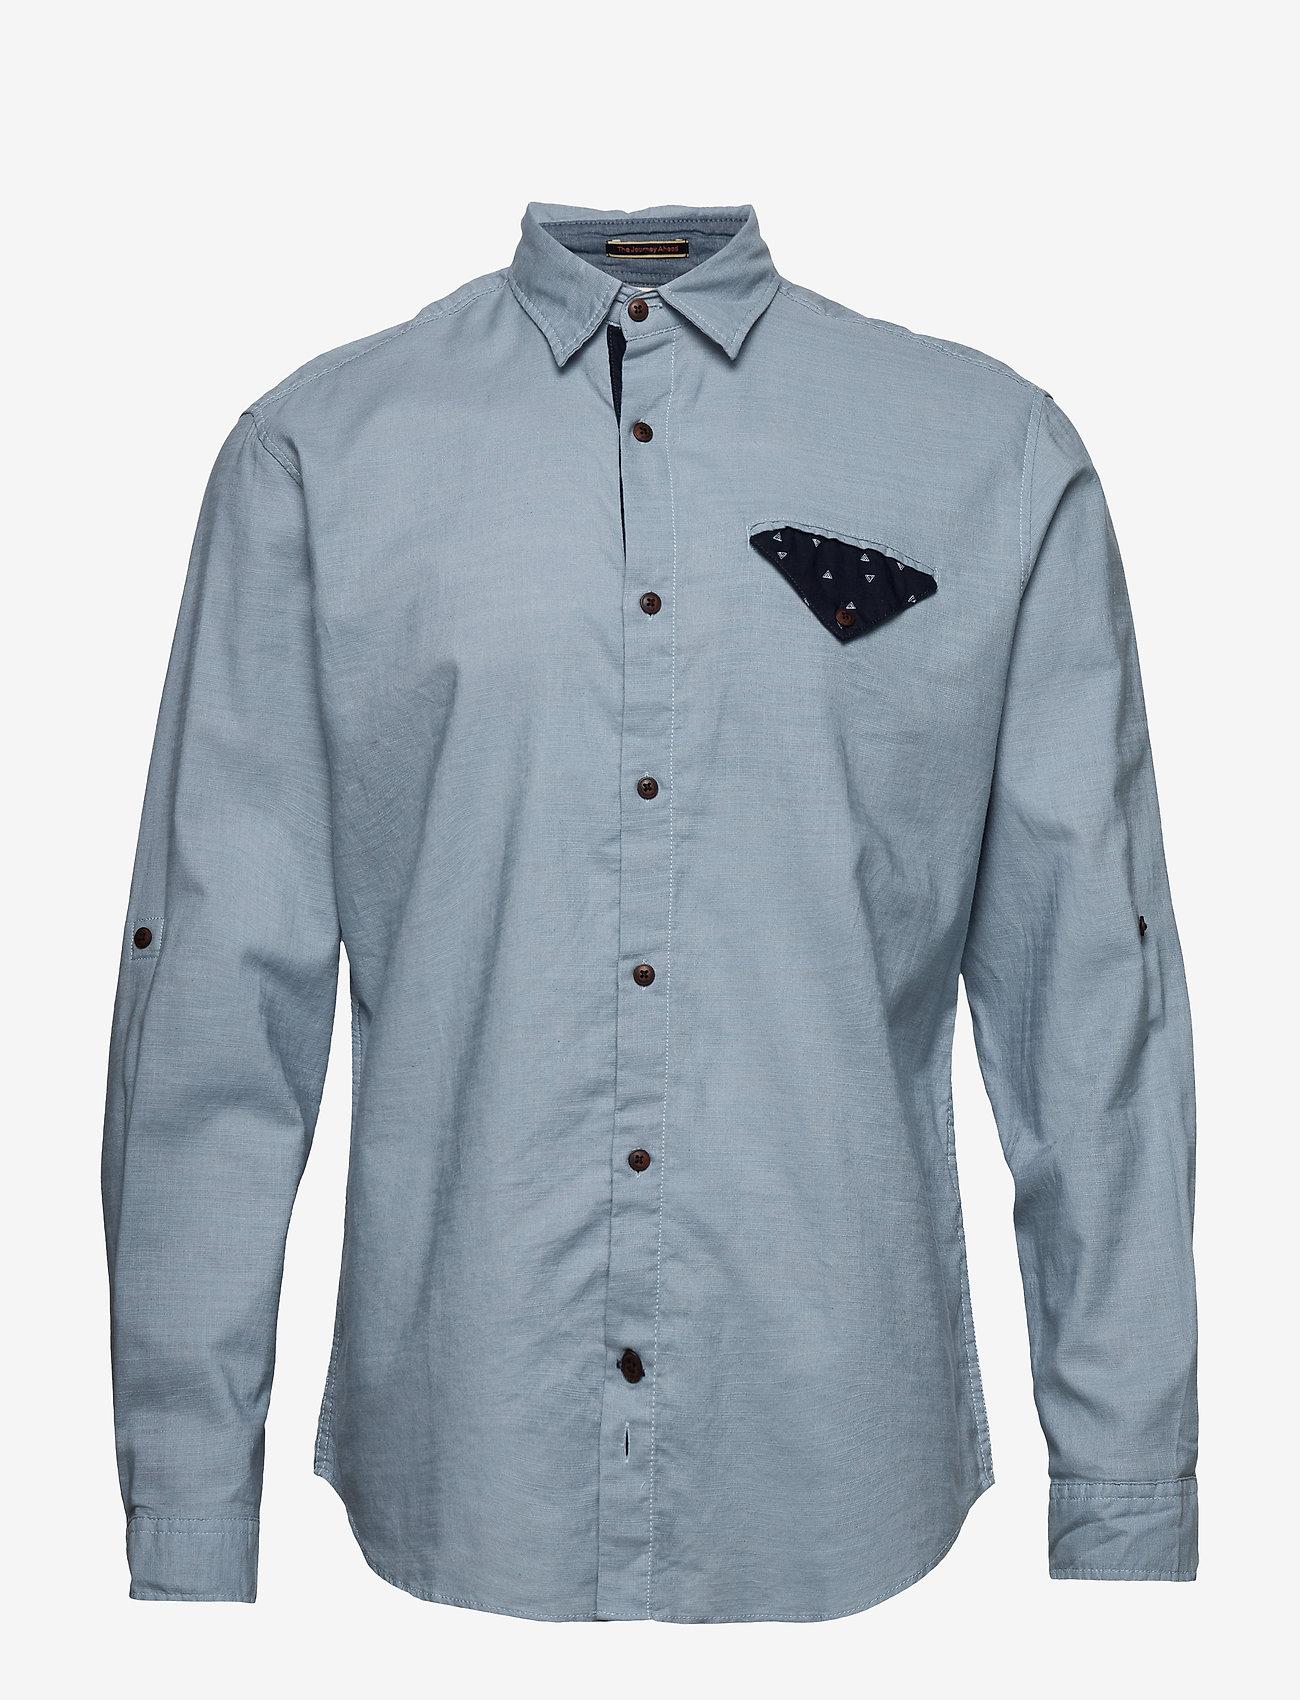 Jack & Jones - JORCHANDLER SHIRT LS - basic skjortor - ashley blue - 0